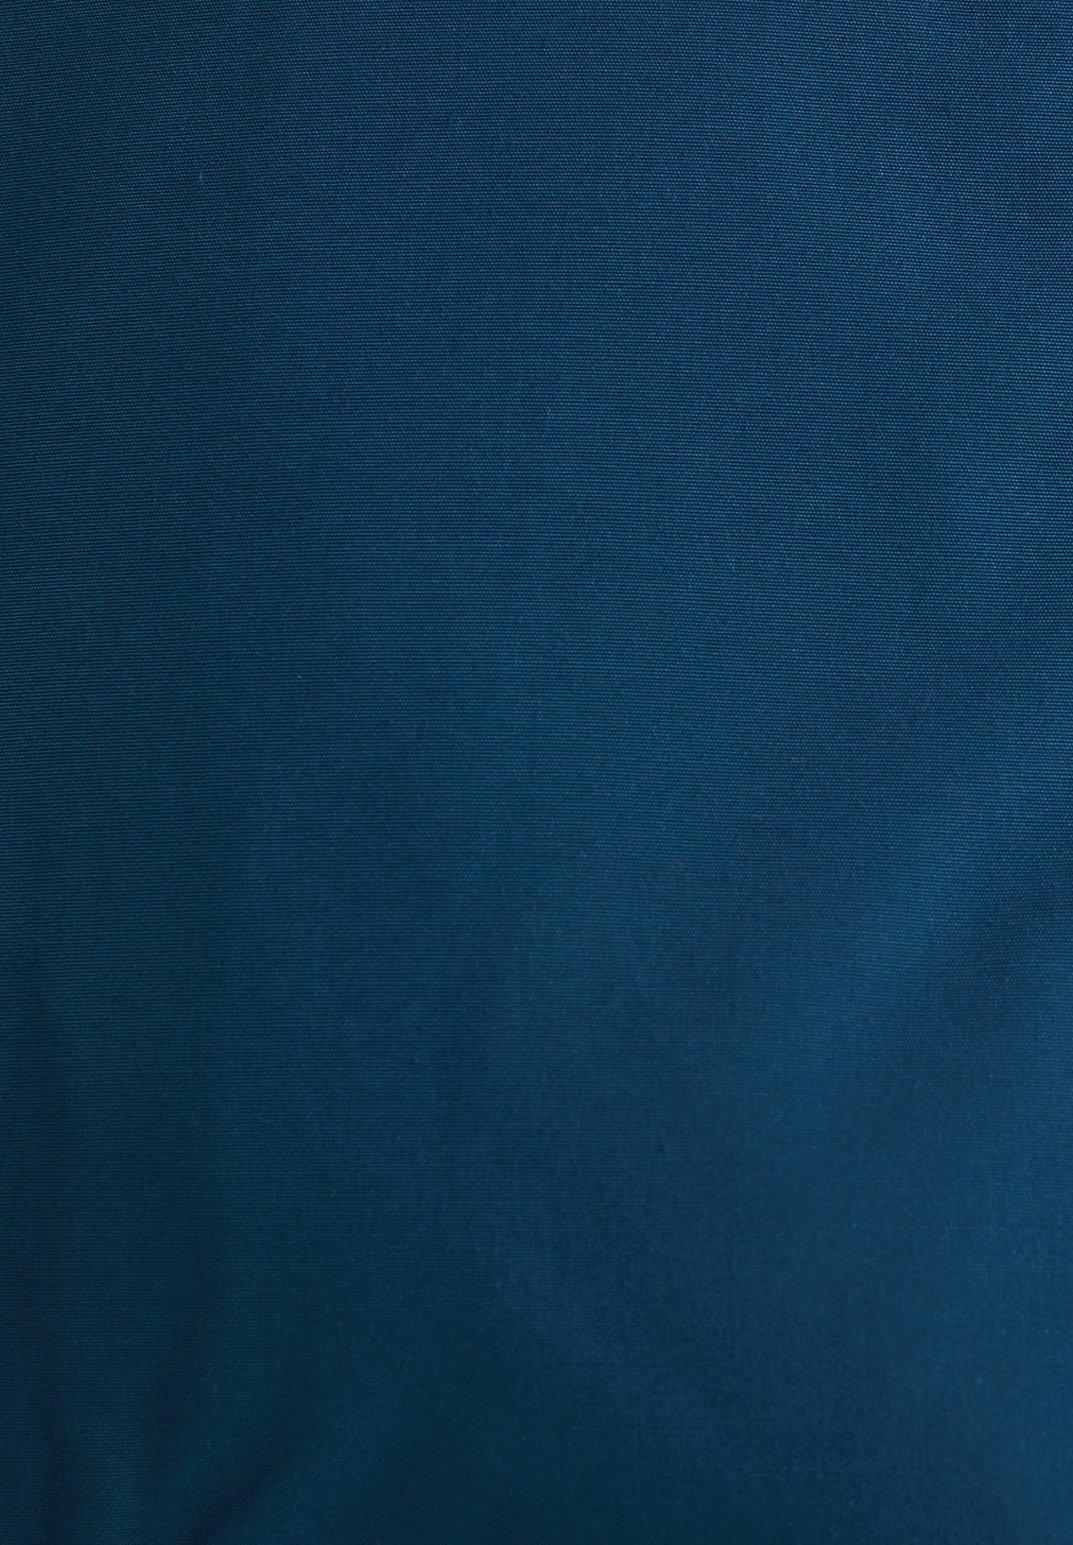 Esprit Bomber* - Bomberjacka Petrol Blue